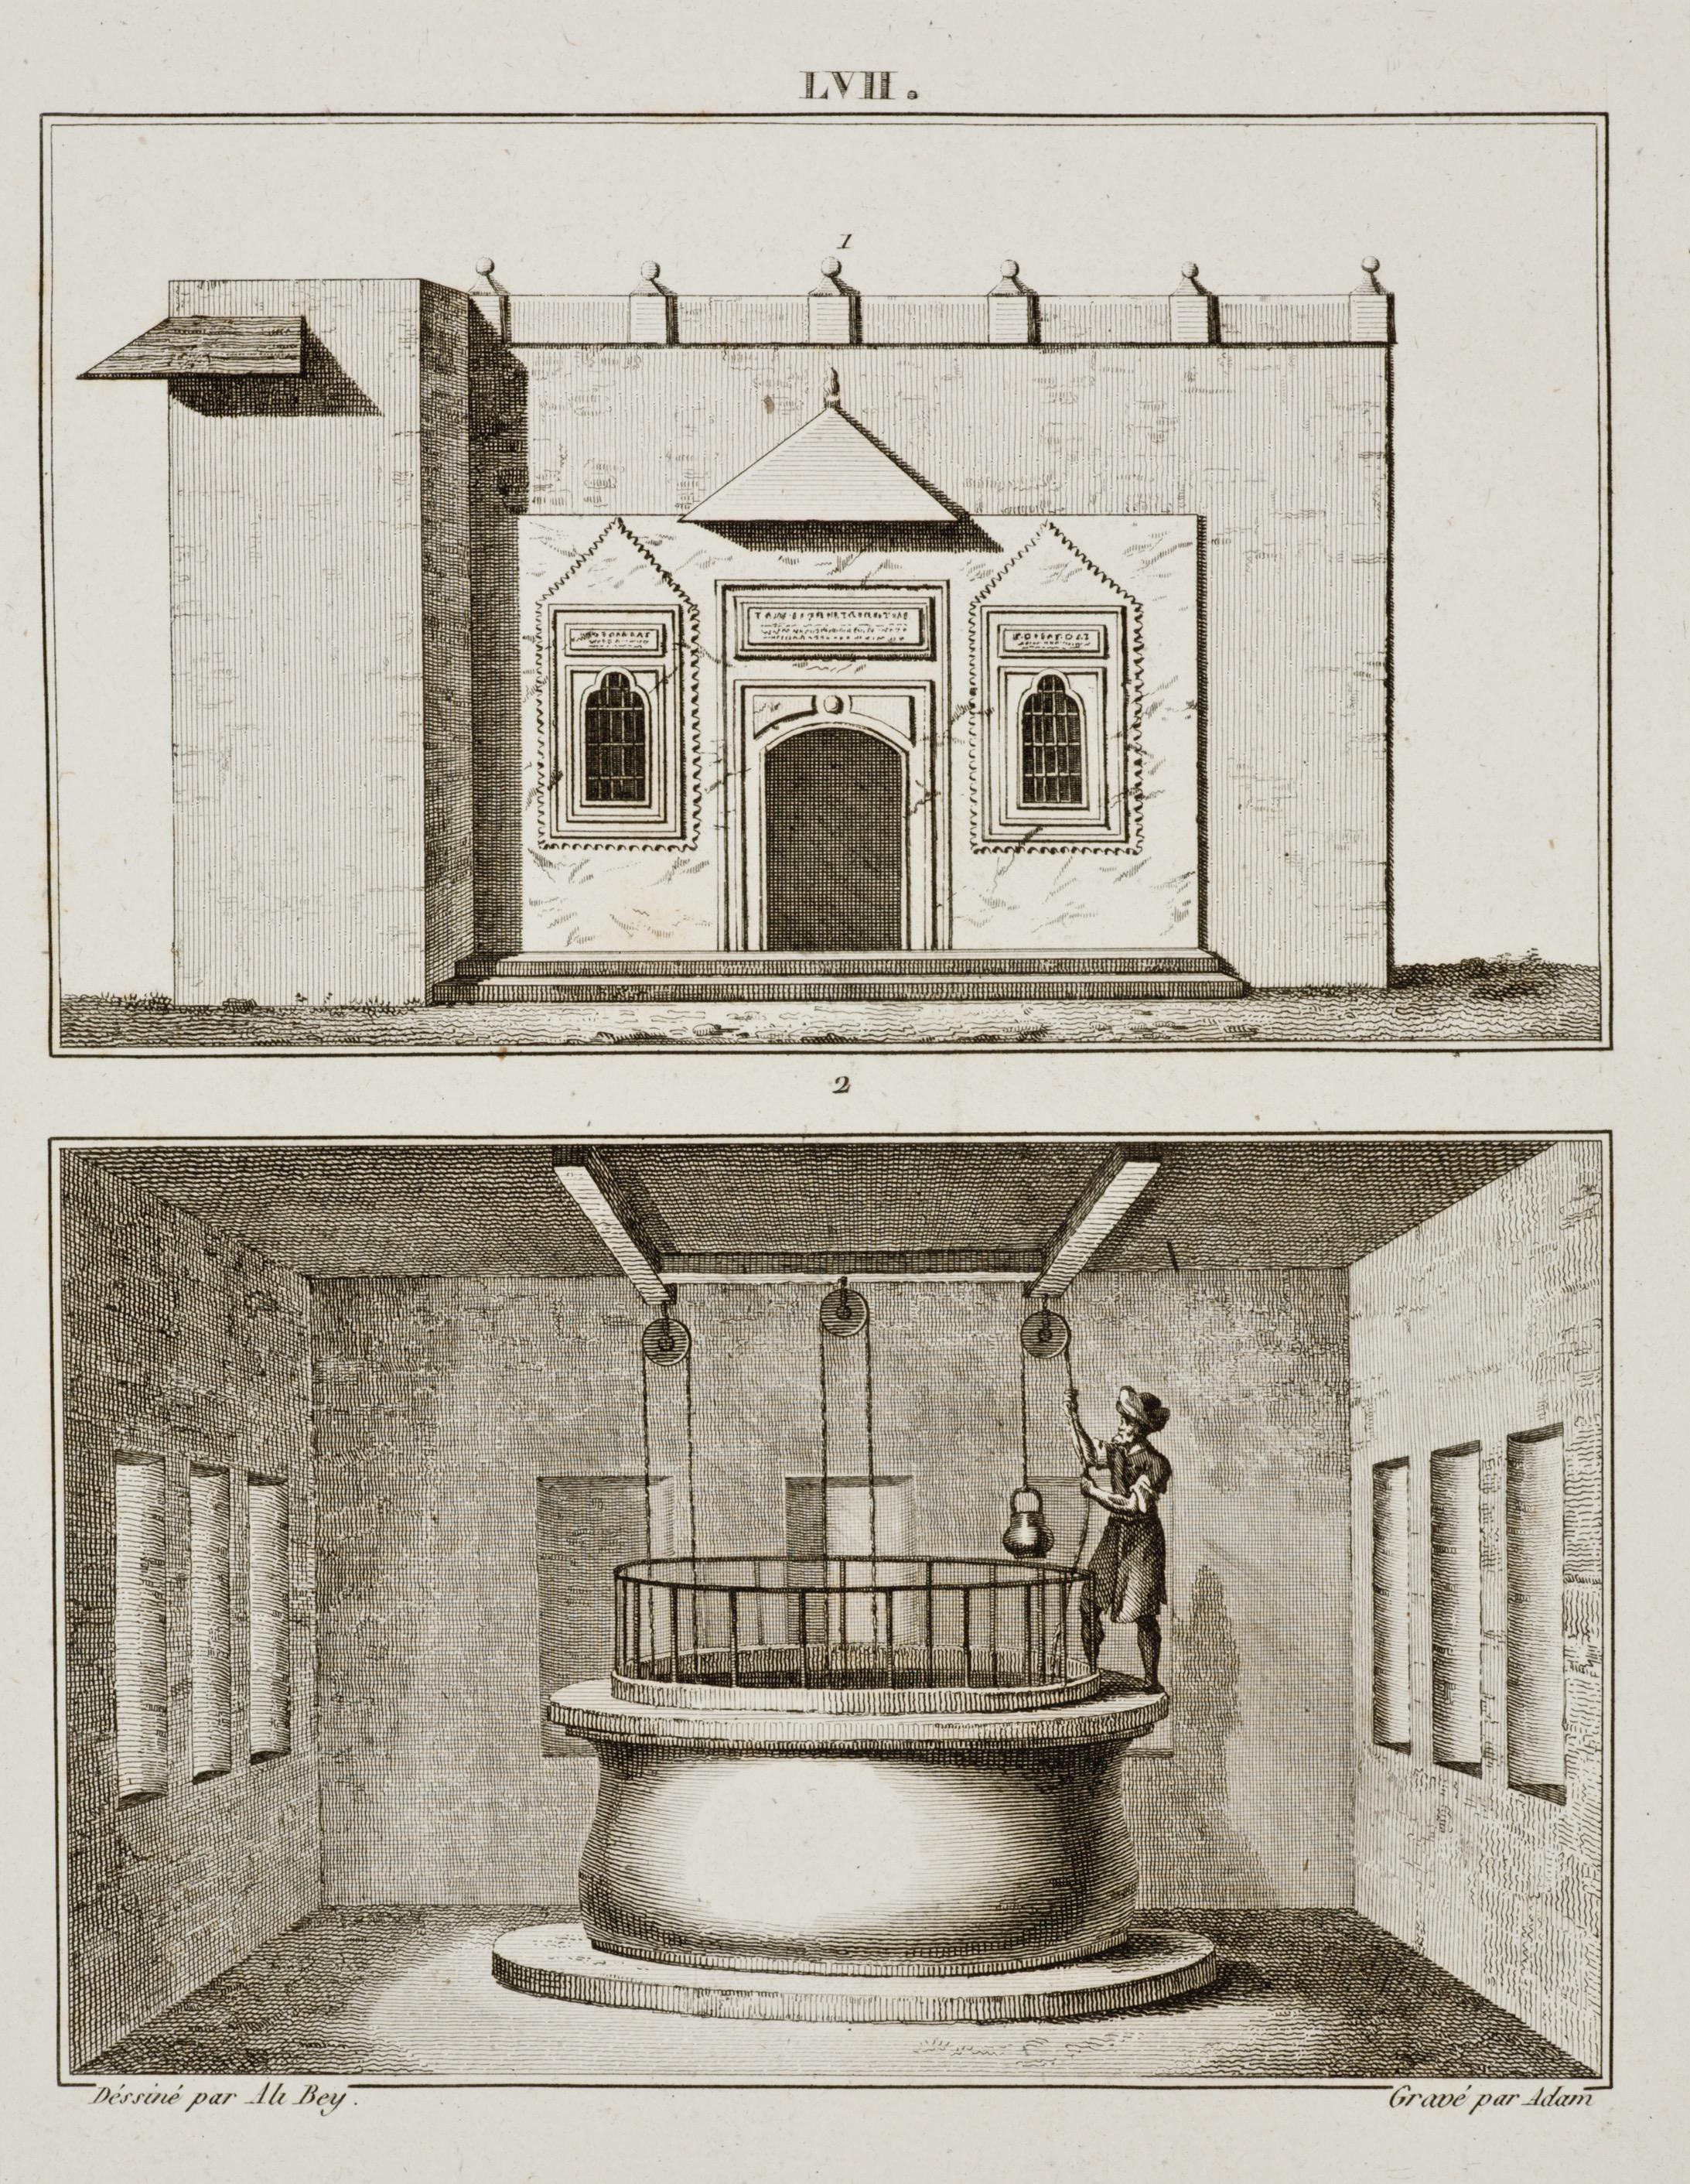 The well of Zamzam from 'Ali Bey El-Abbassi, Travels of Ali Bey, in Morocco, Tripoli, Cyprus, Egypt, Arabia, Syria, and Turkey